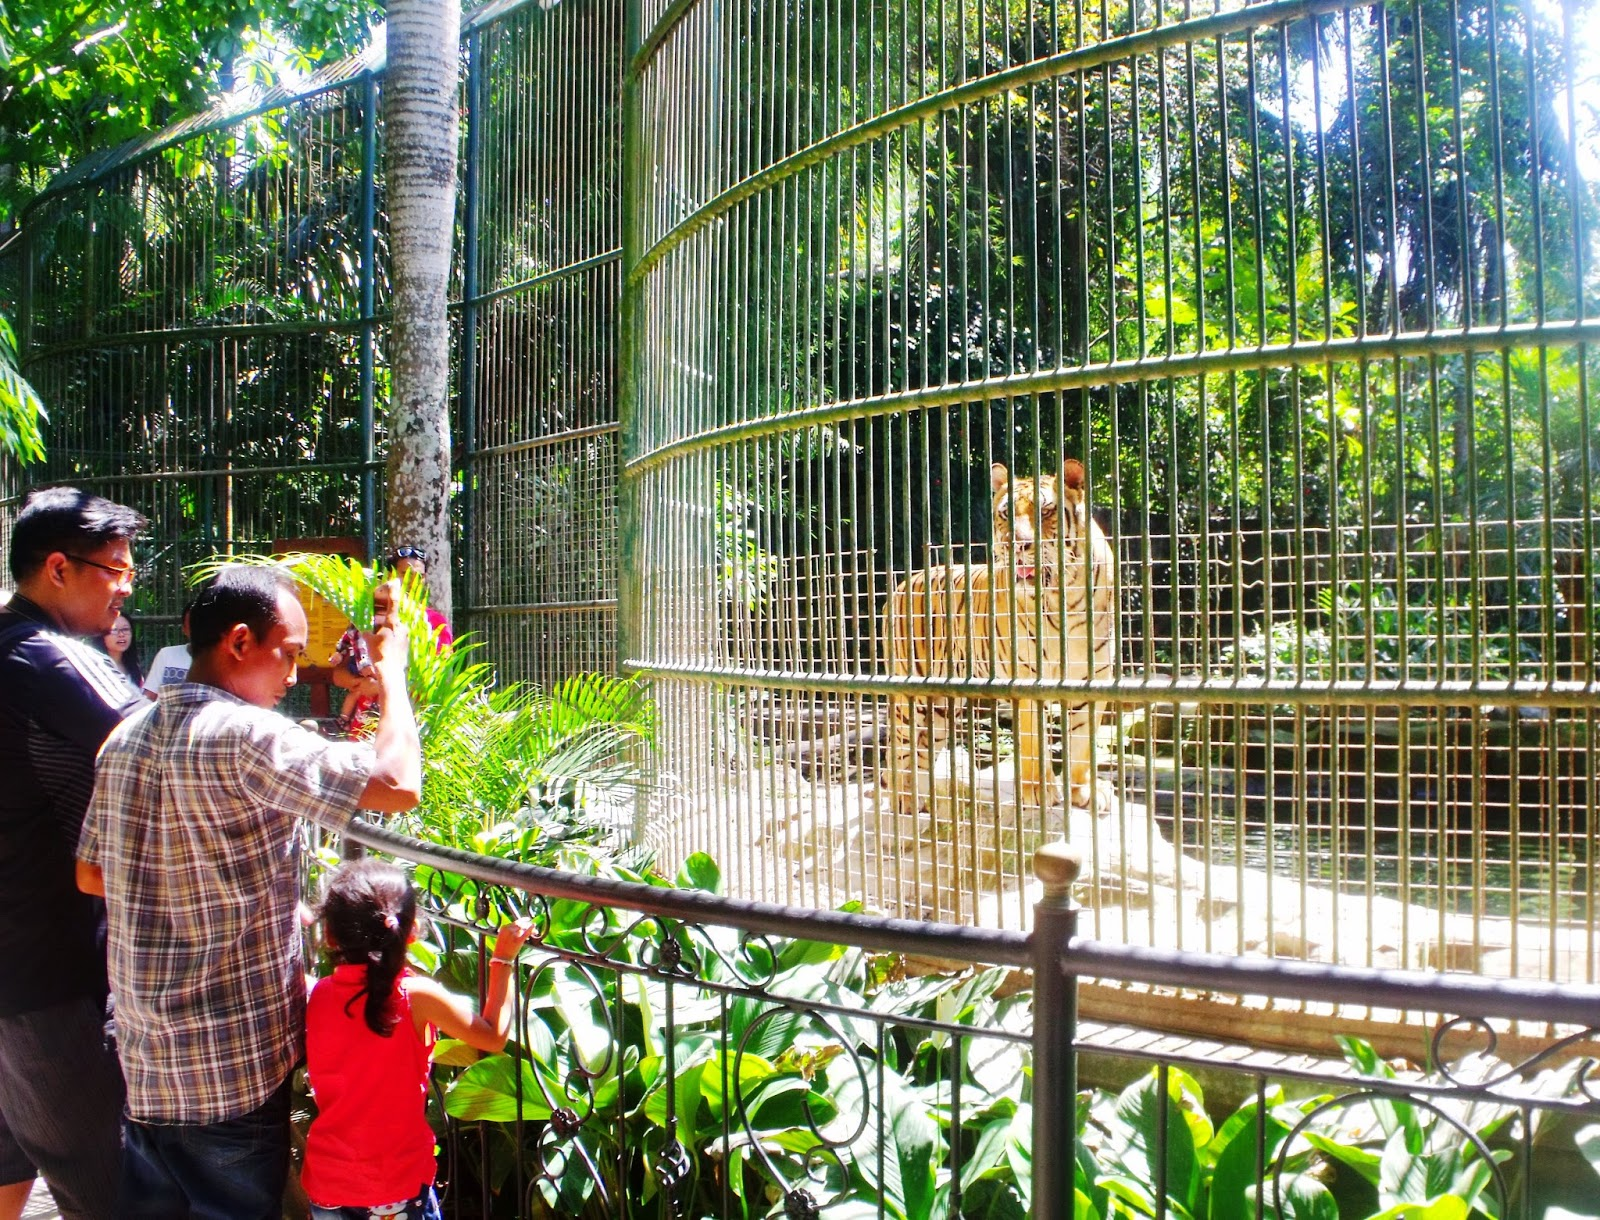 Berwisata Tengah Aneka Hewan Bali Zoo Park Catatan Kaki Salah